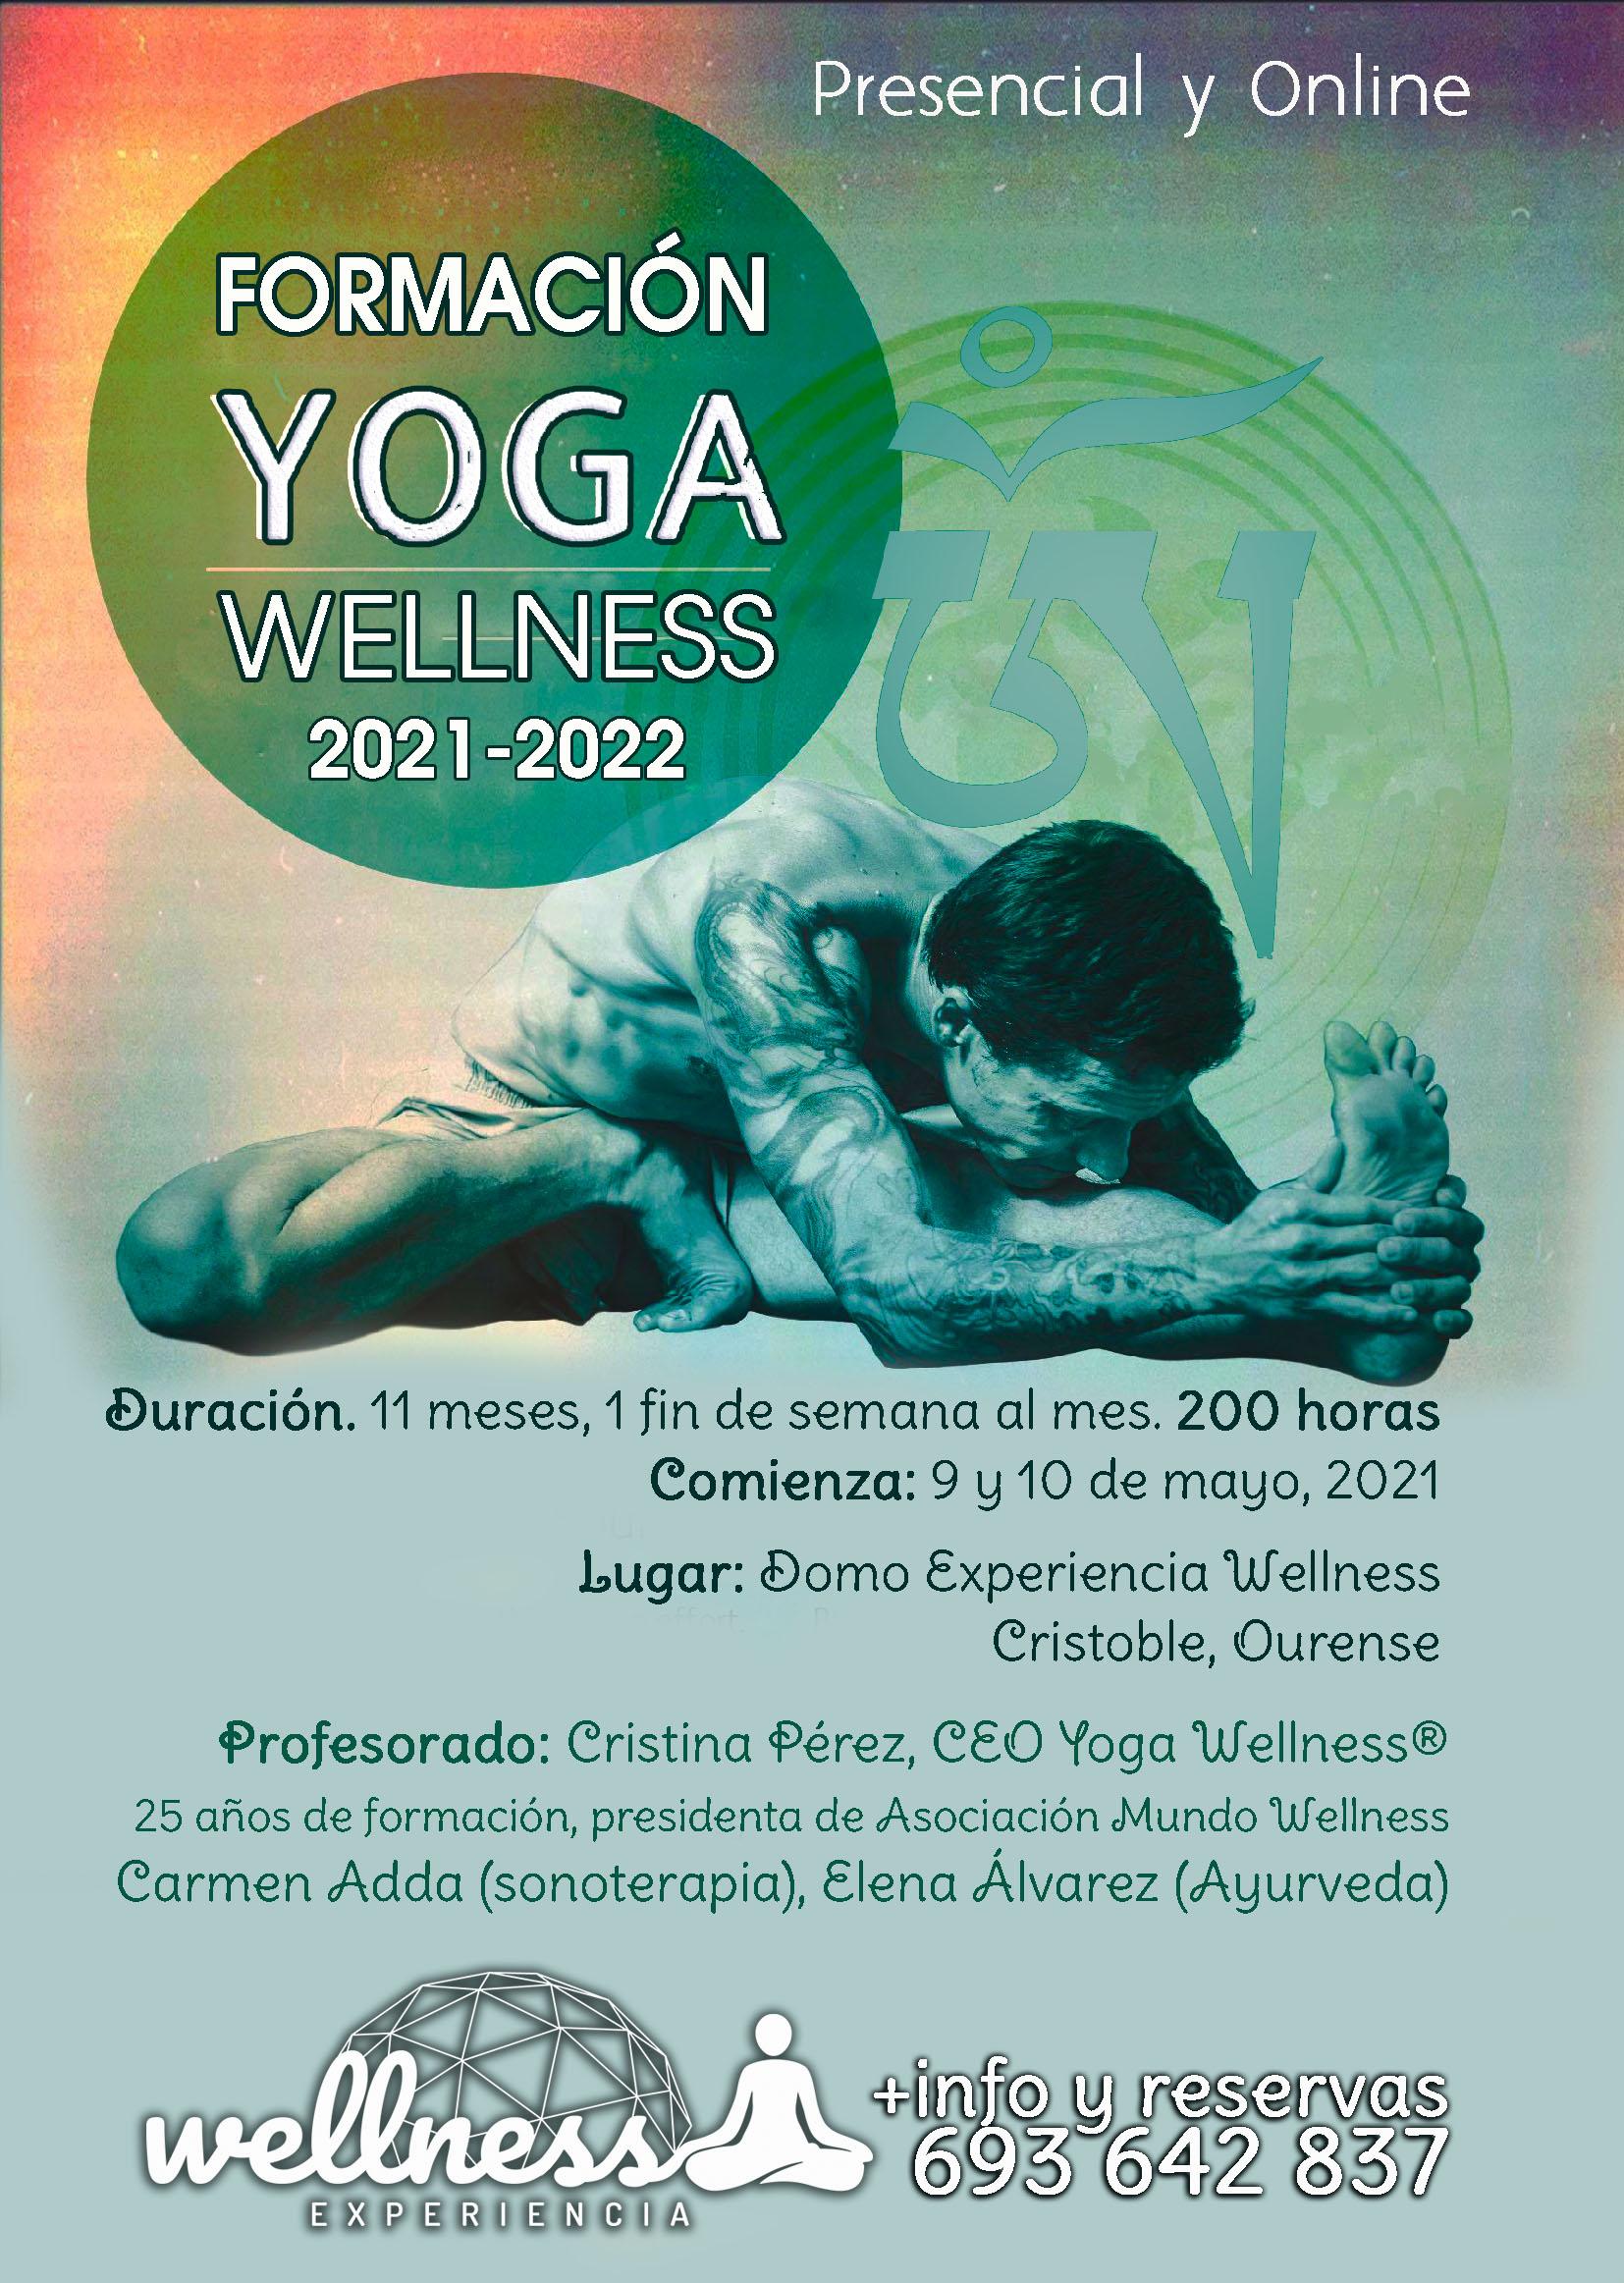 yoga-wellness-formacion-ourense-2021-1